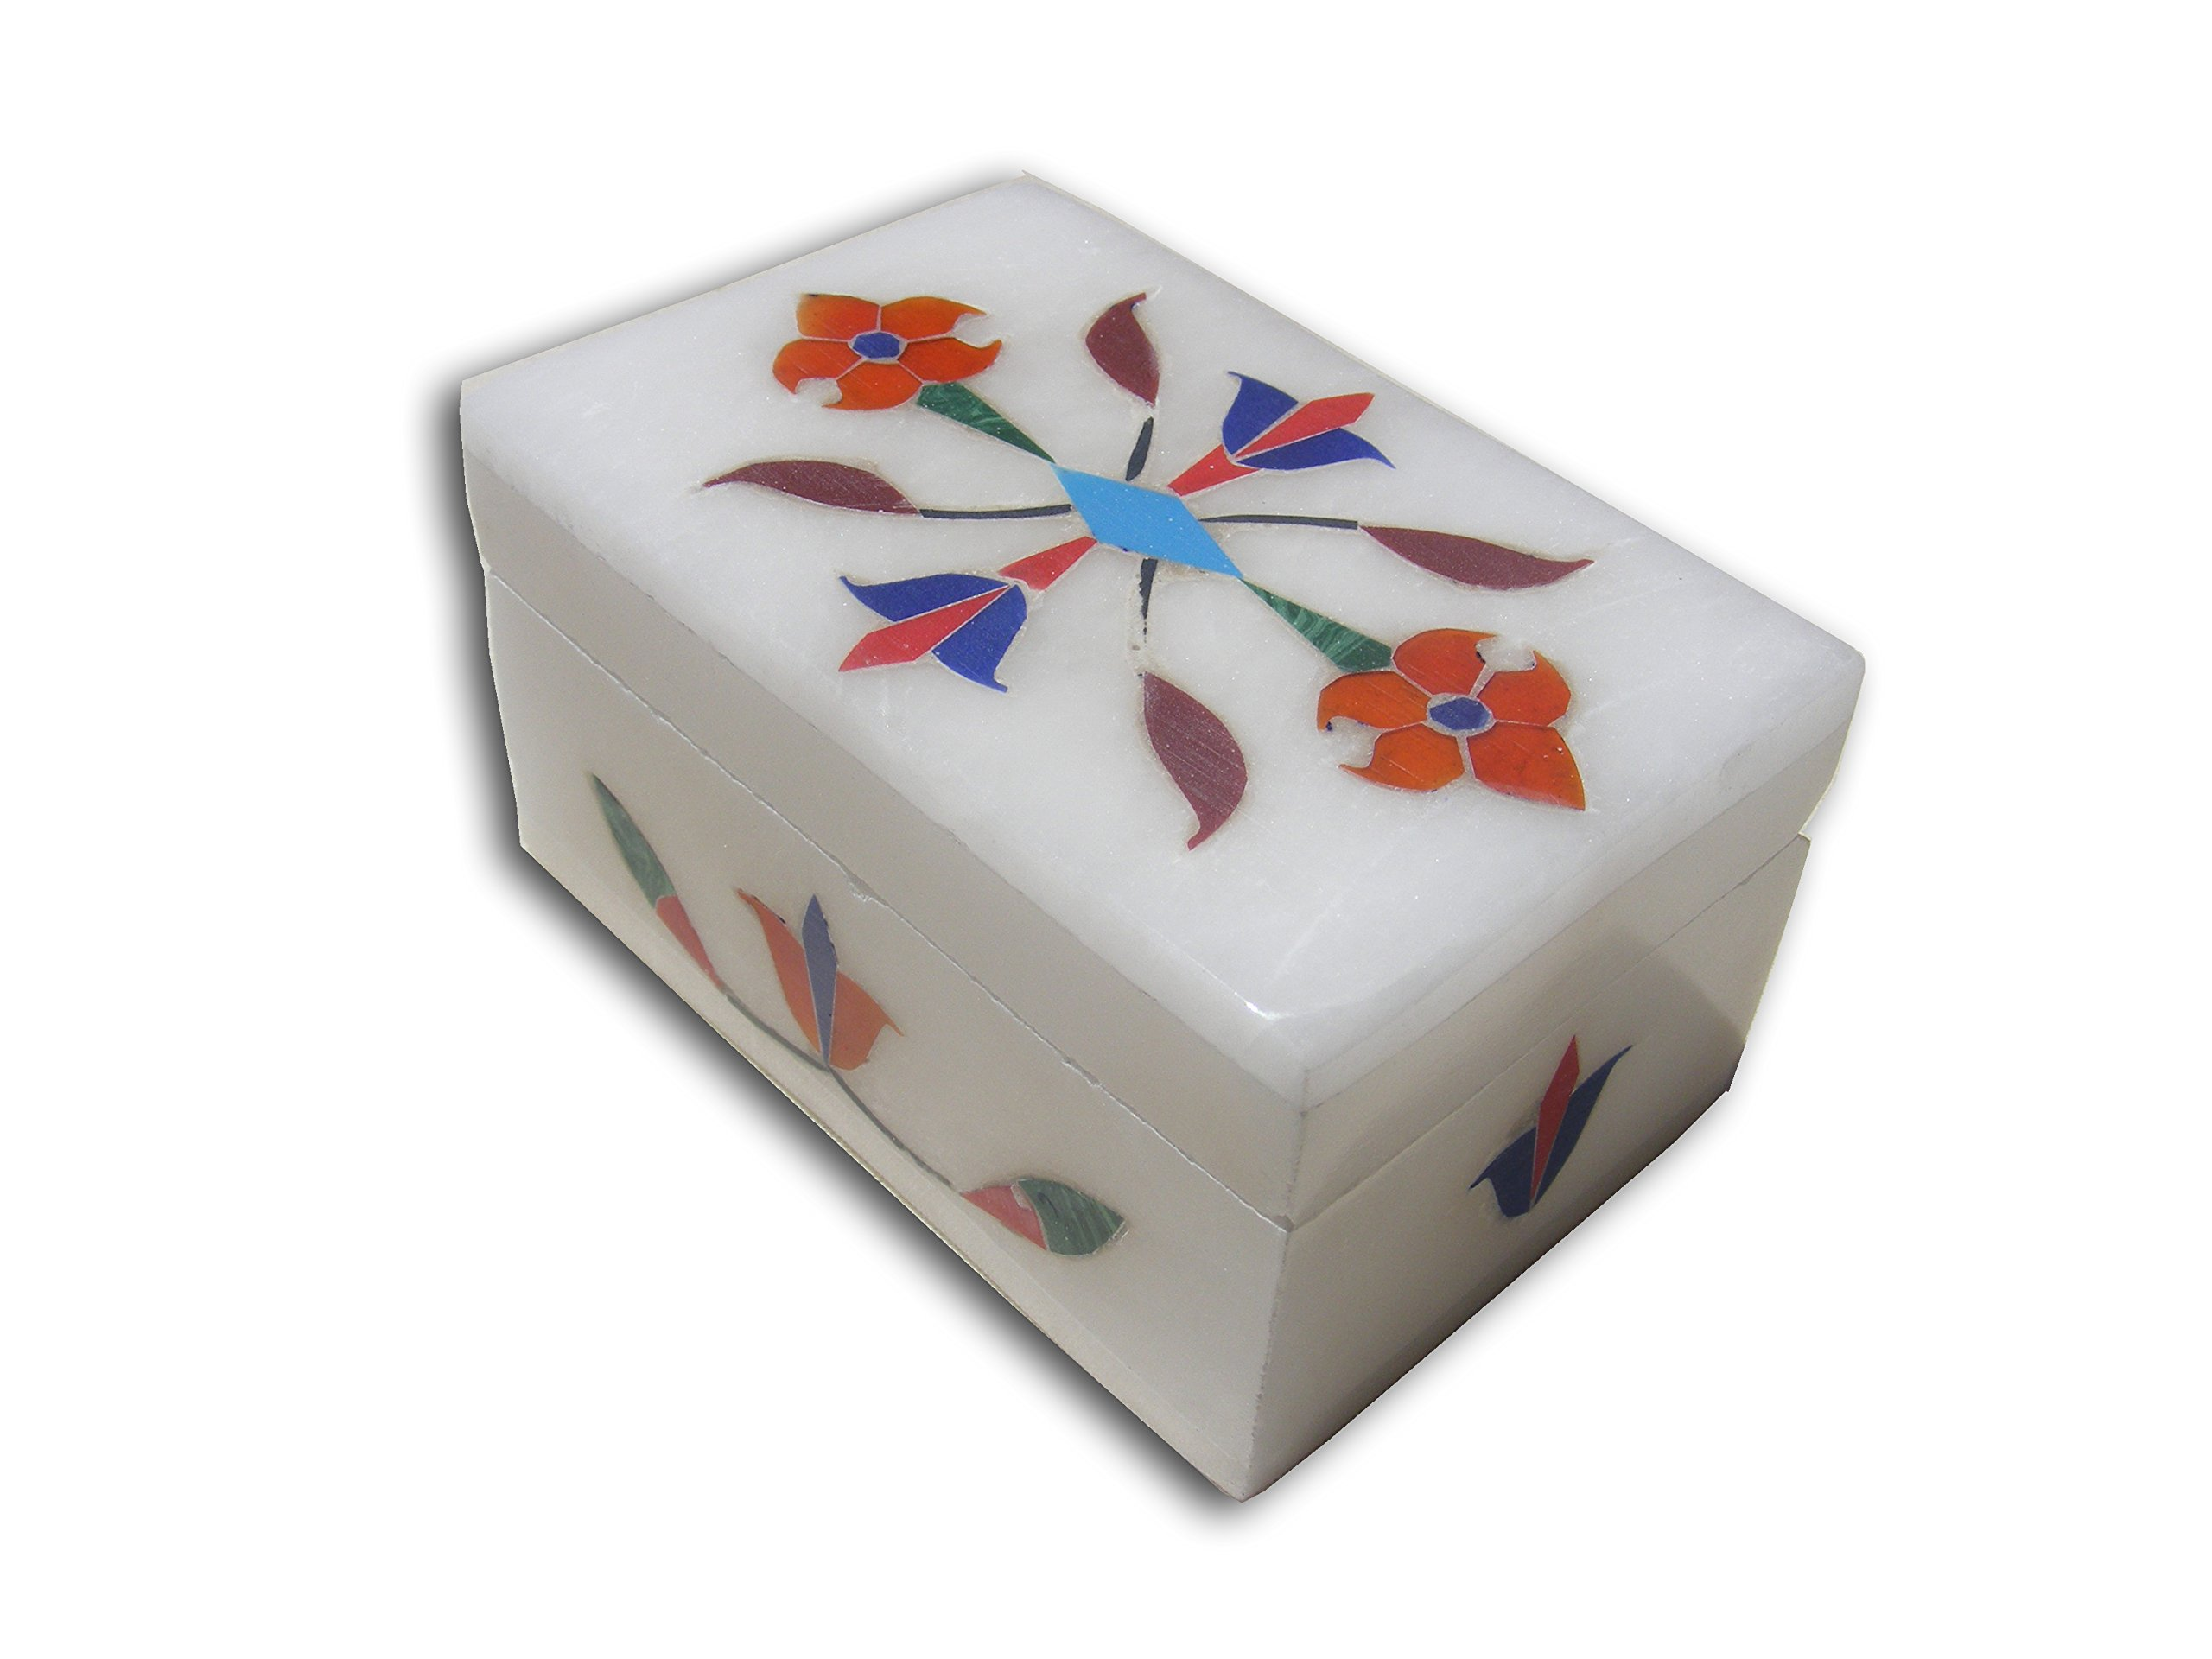 3'' Handmade White Alabaster Soapstone Box, Trinket Jewelry Storage Box, Inlay Work Design